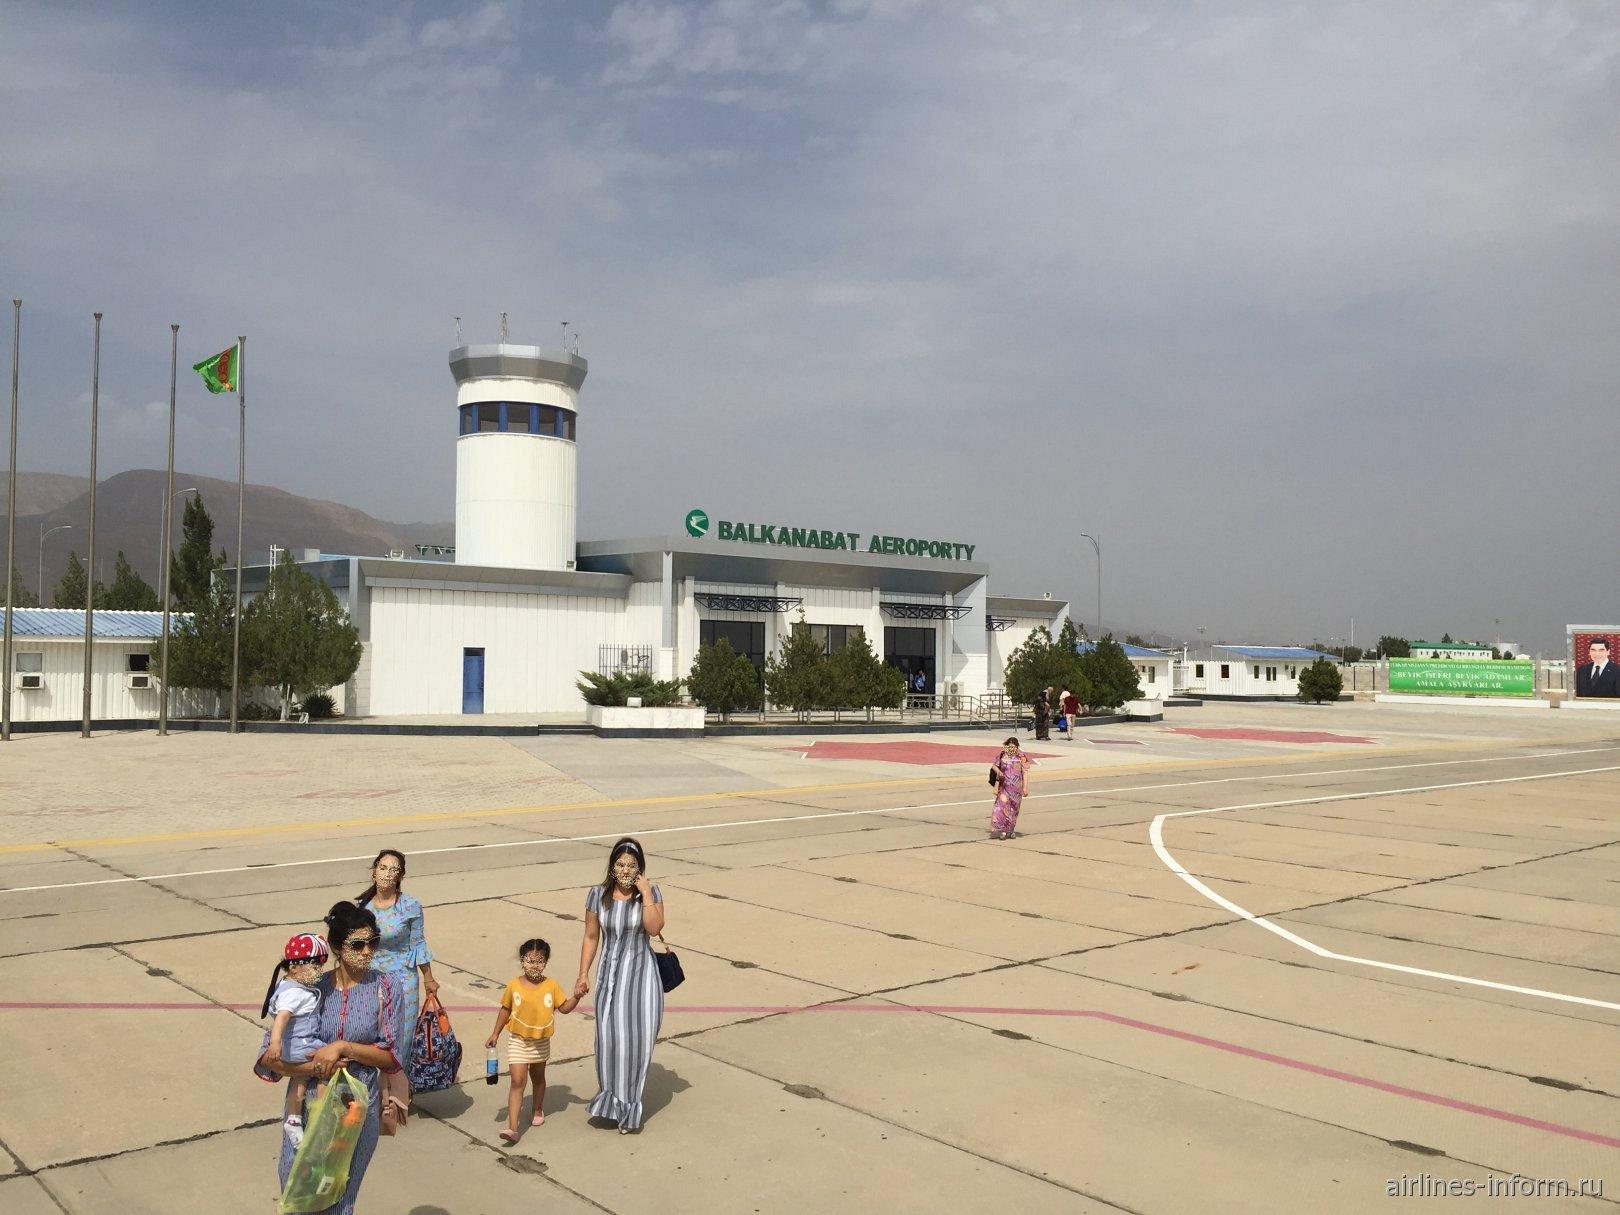 Аэровокзал аэропорта Балканабад